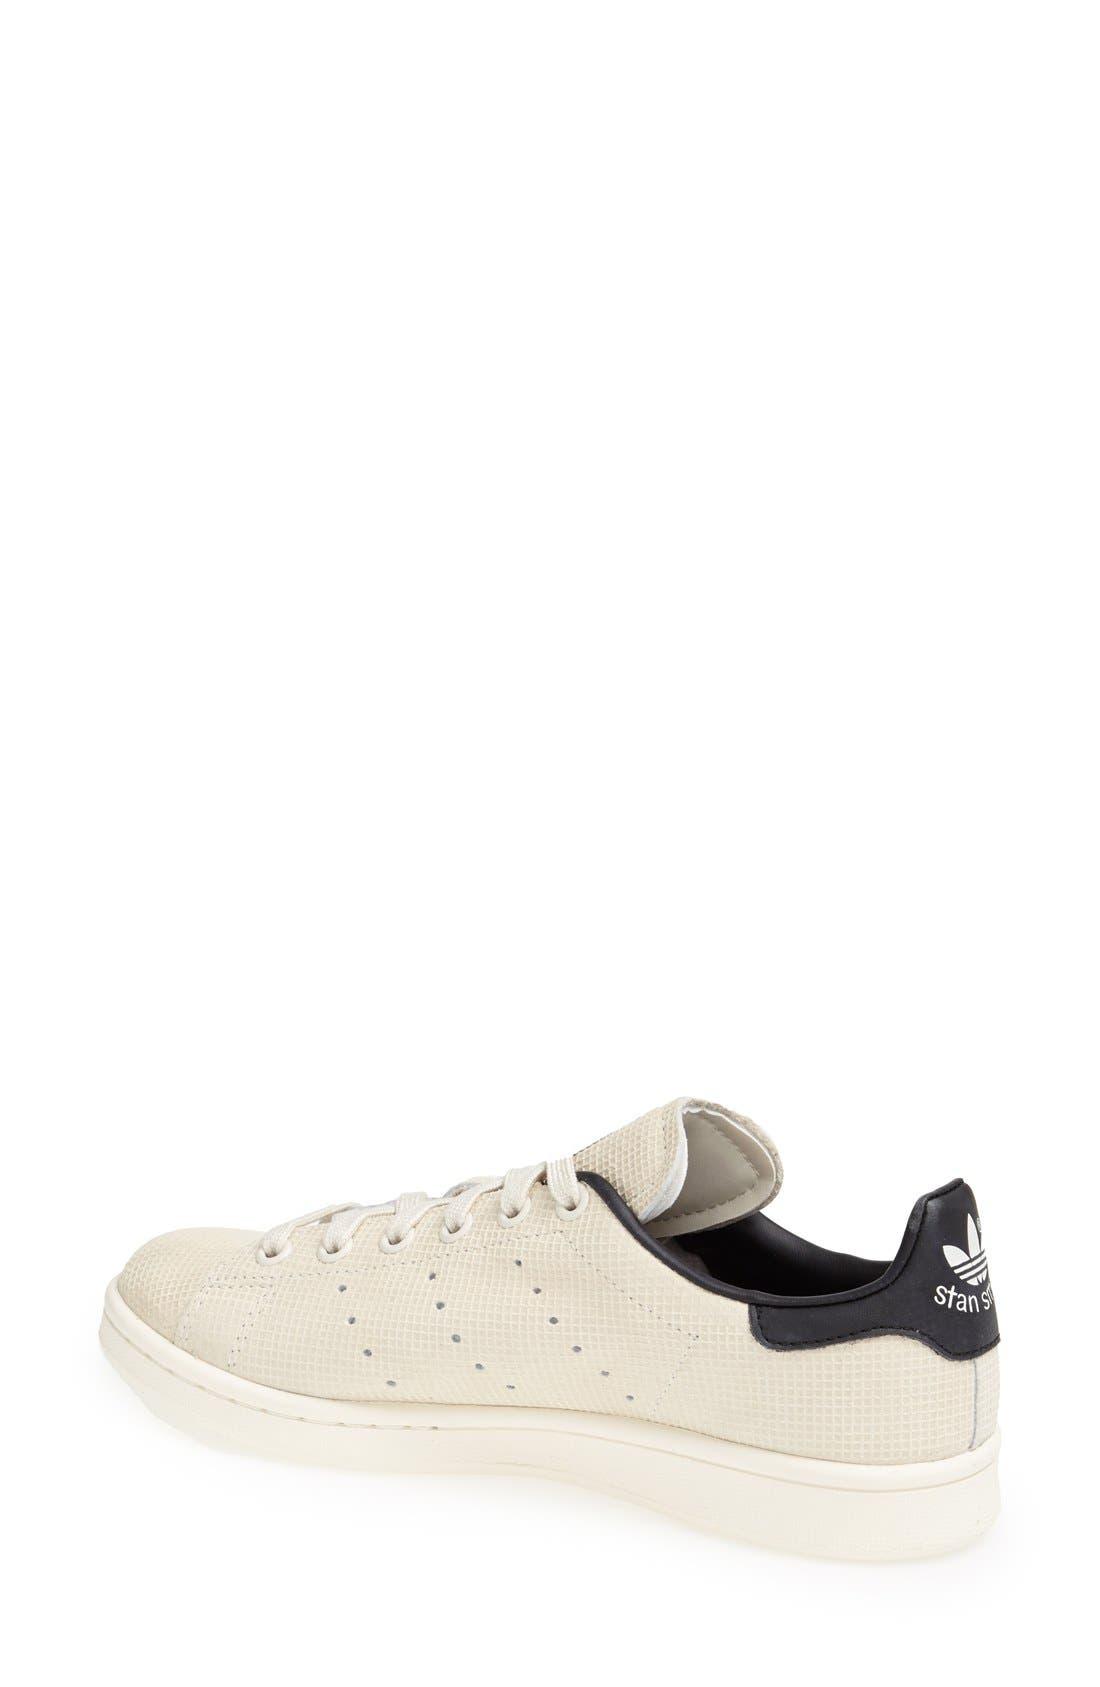 'Stan Smith' Sneaker,                             Alternate thumbnail 4, color,                             100